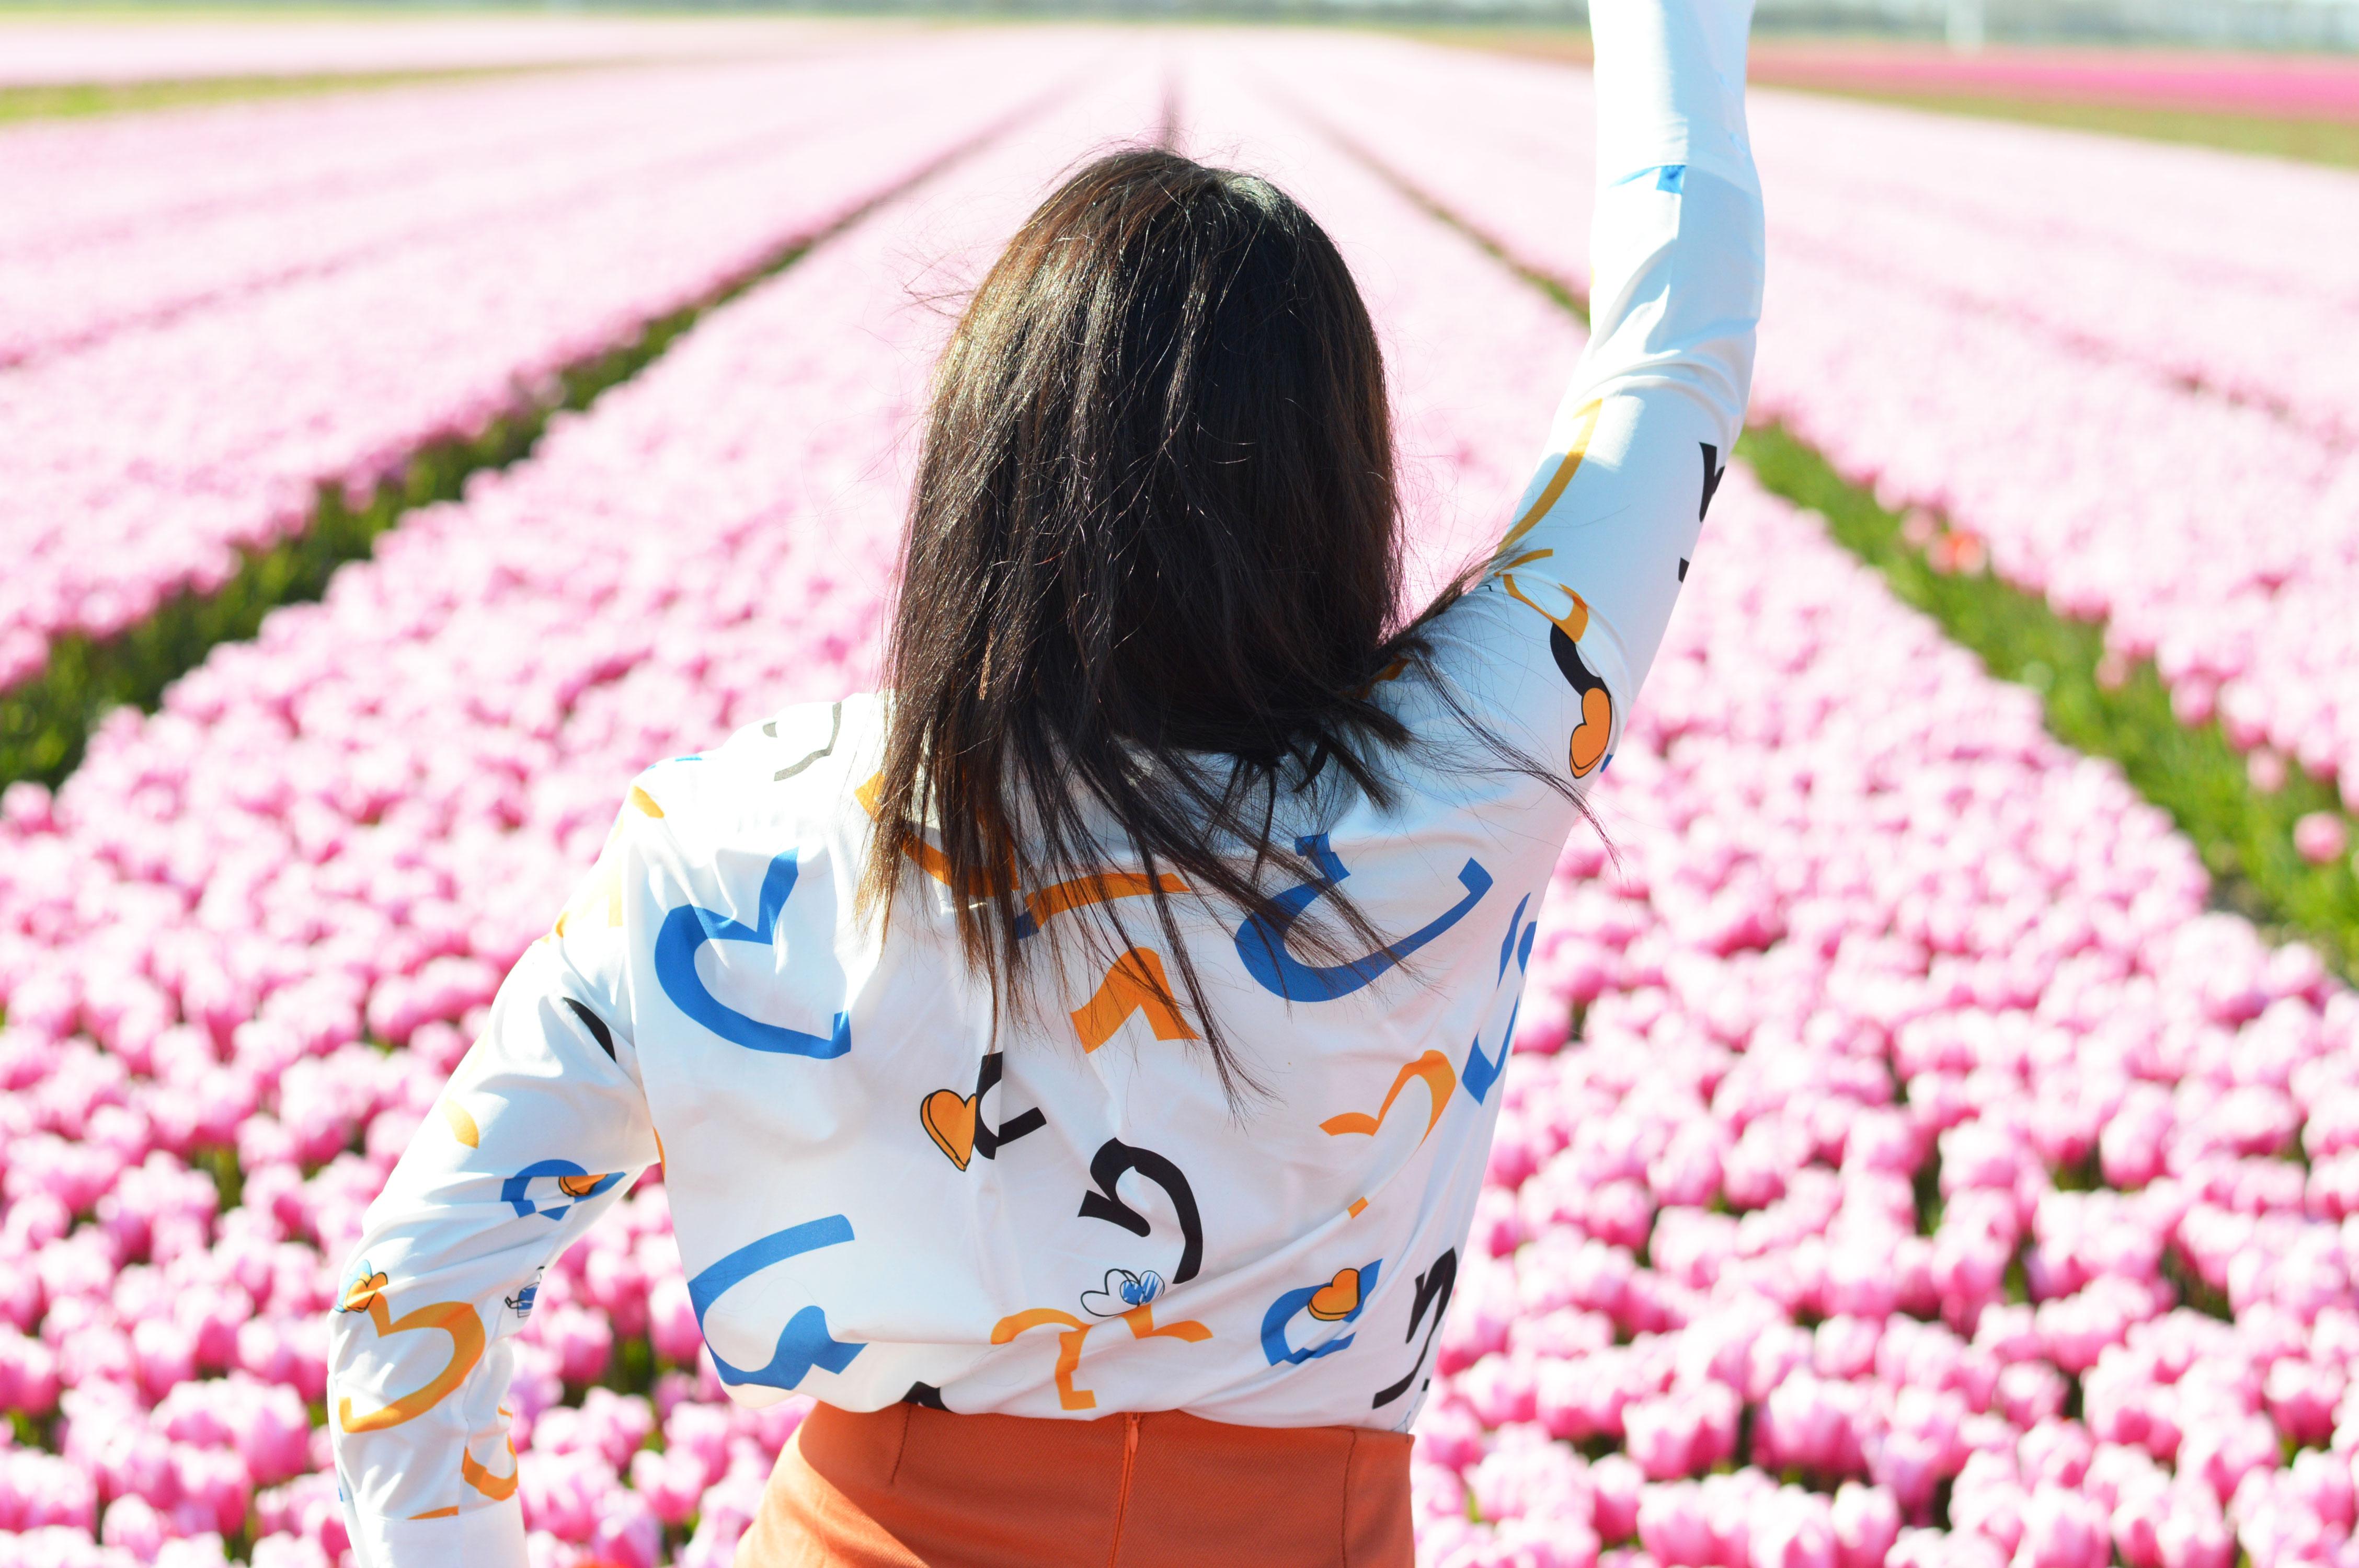 tulipsinholland4